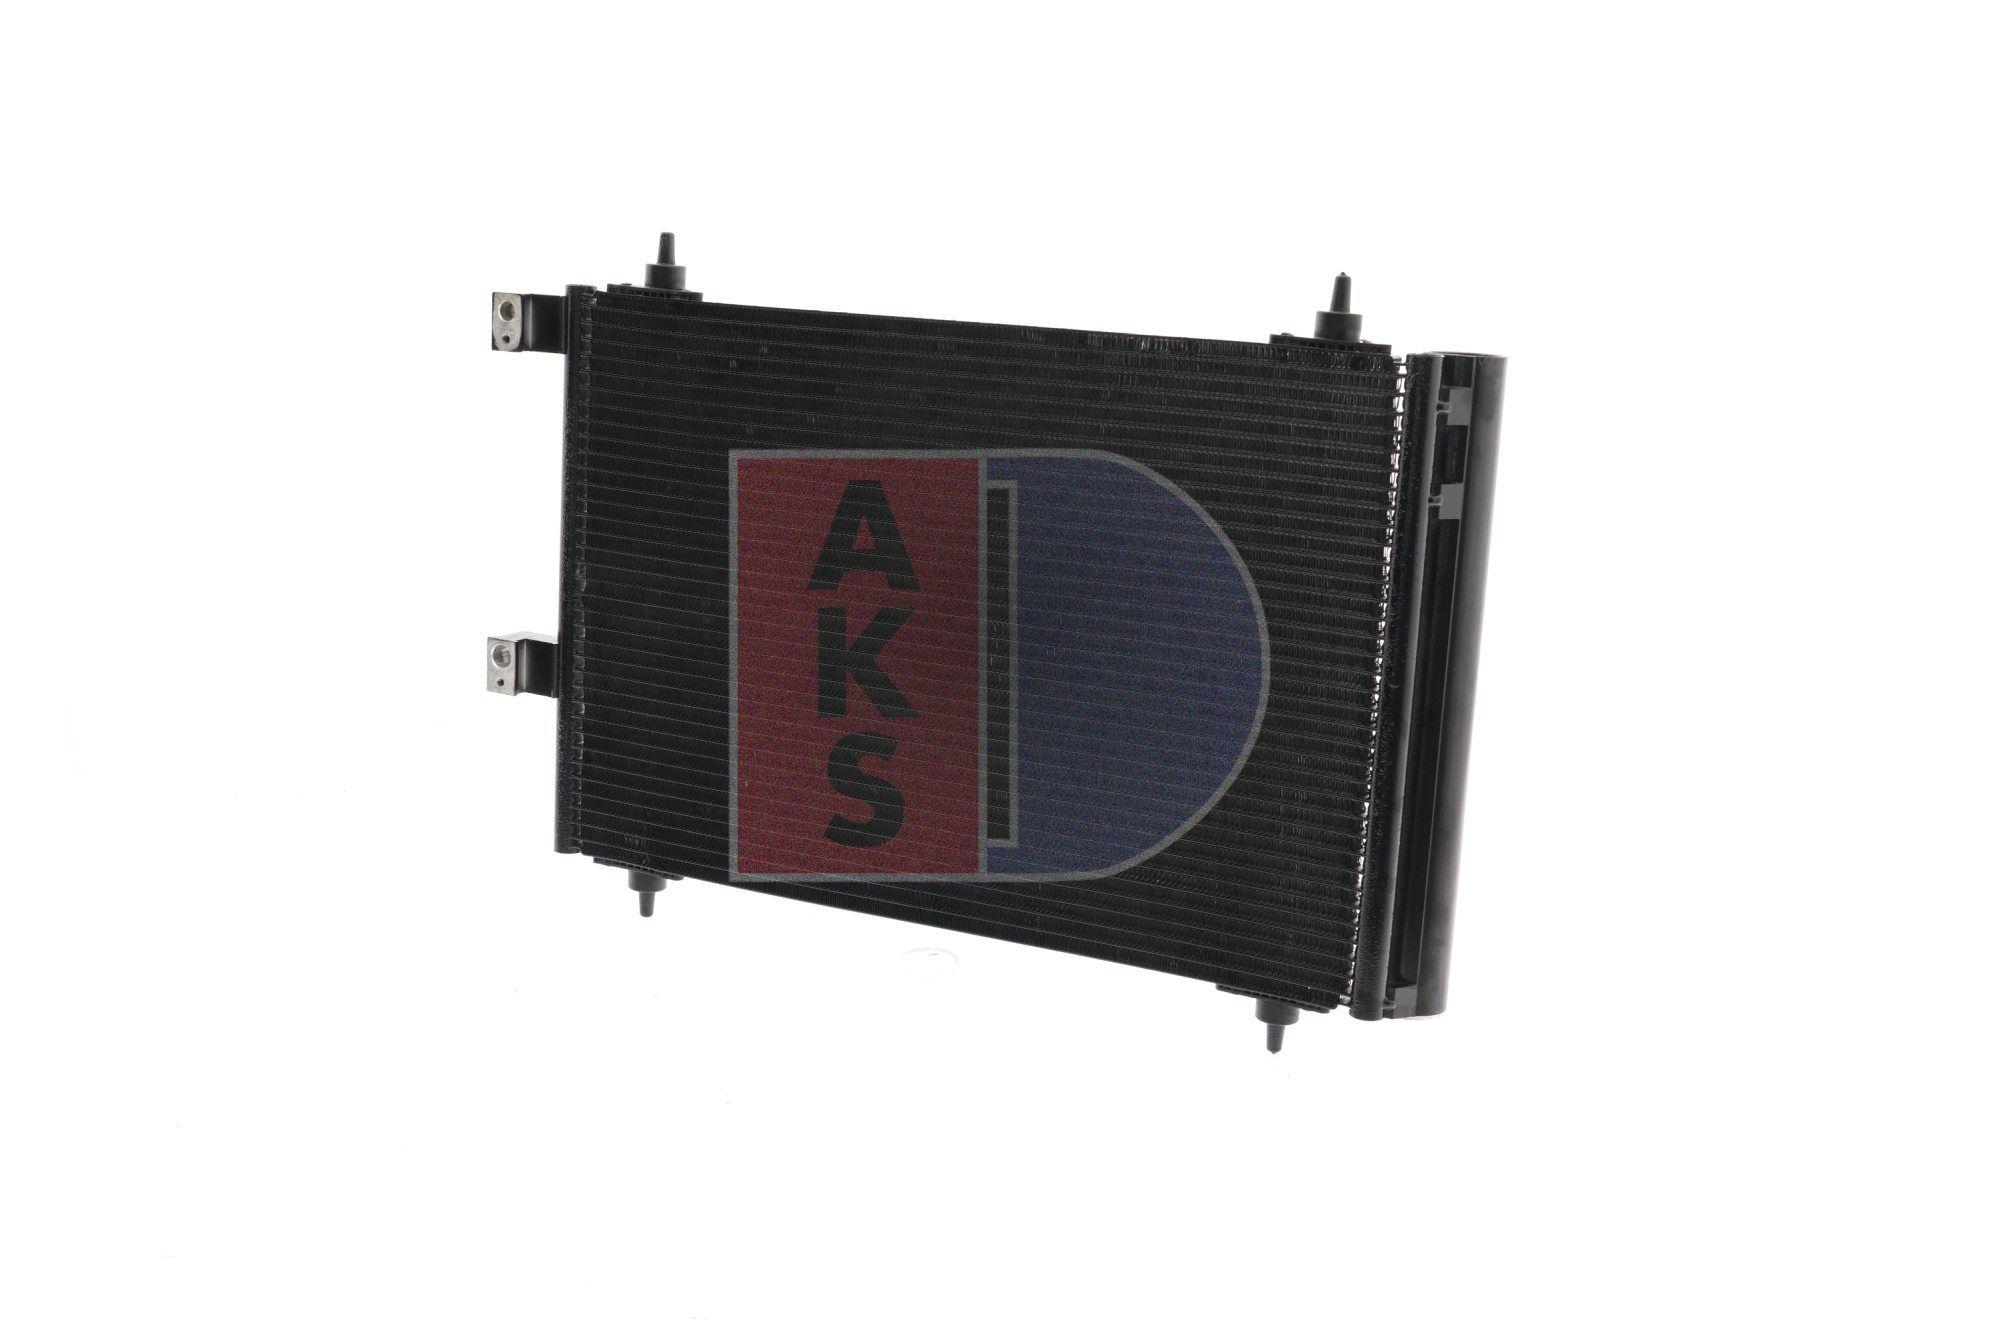 Klimakondensator 162004N AKS DASIS 162004N in Original Qualität